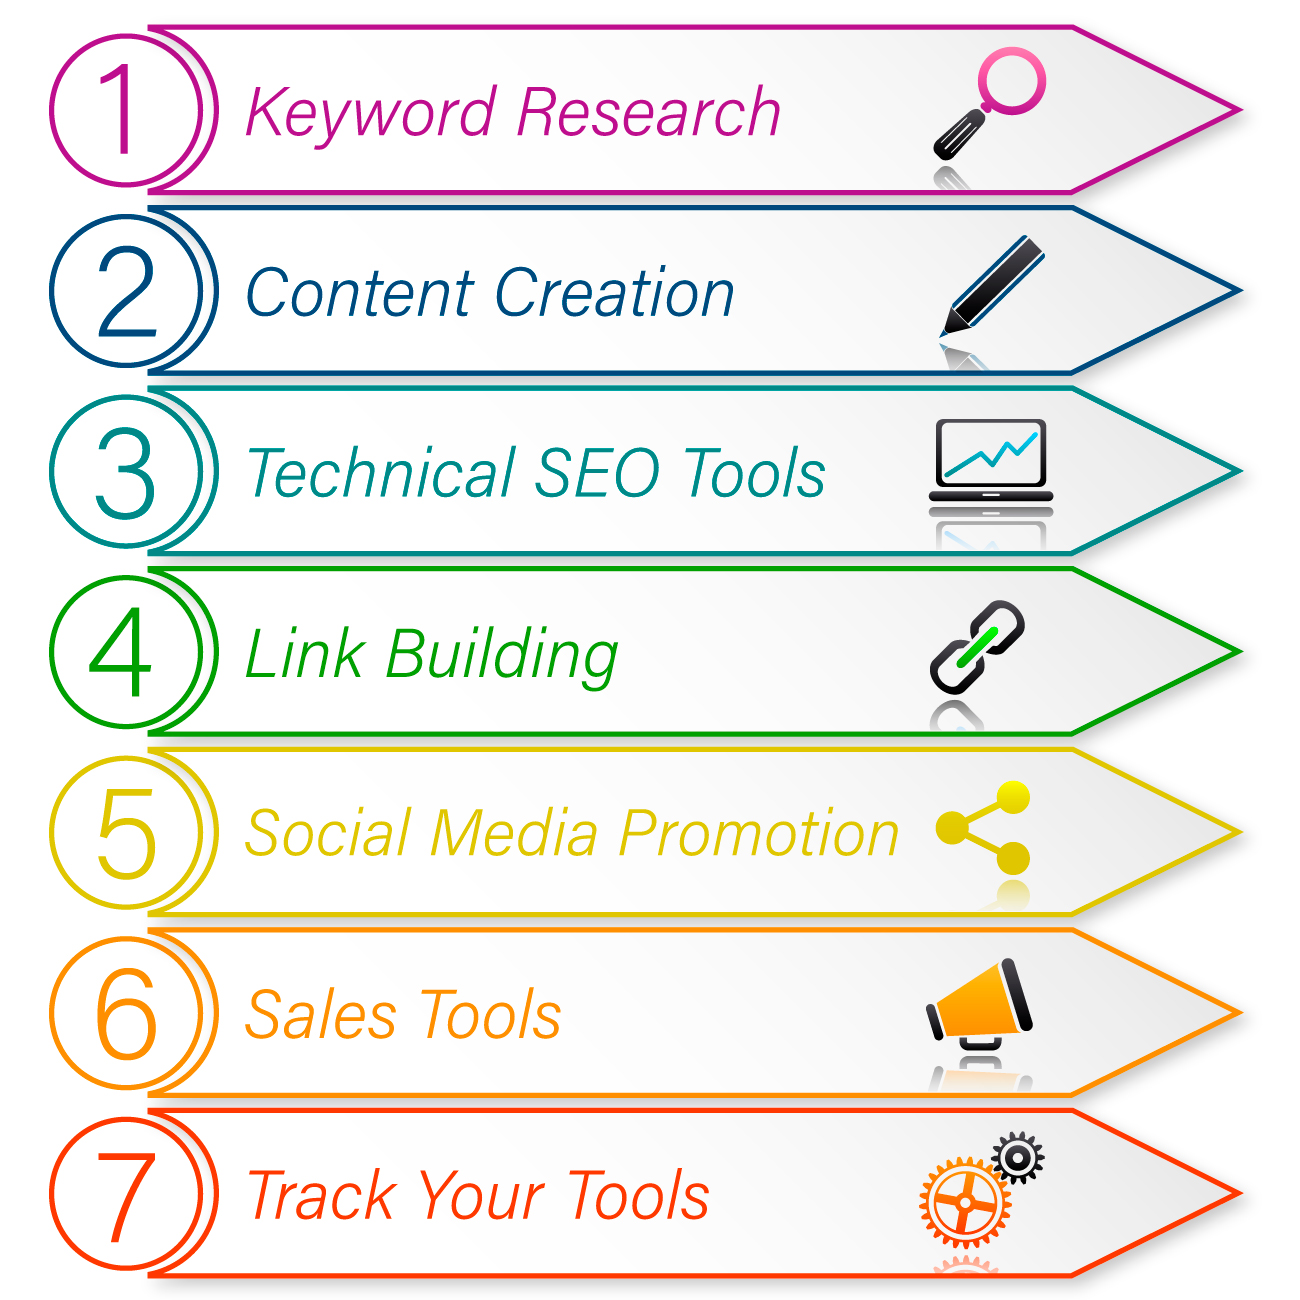 7 Steps to online marketing